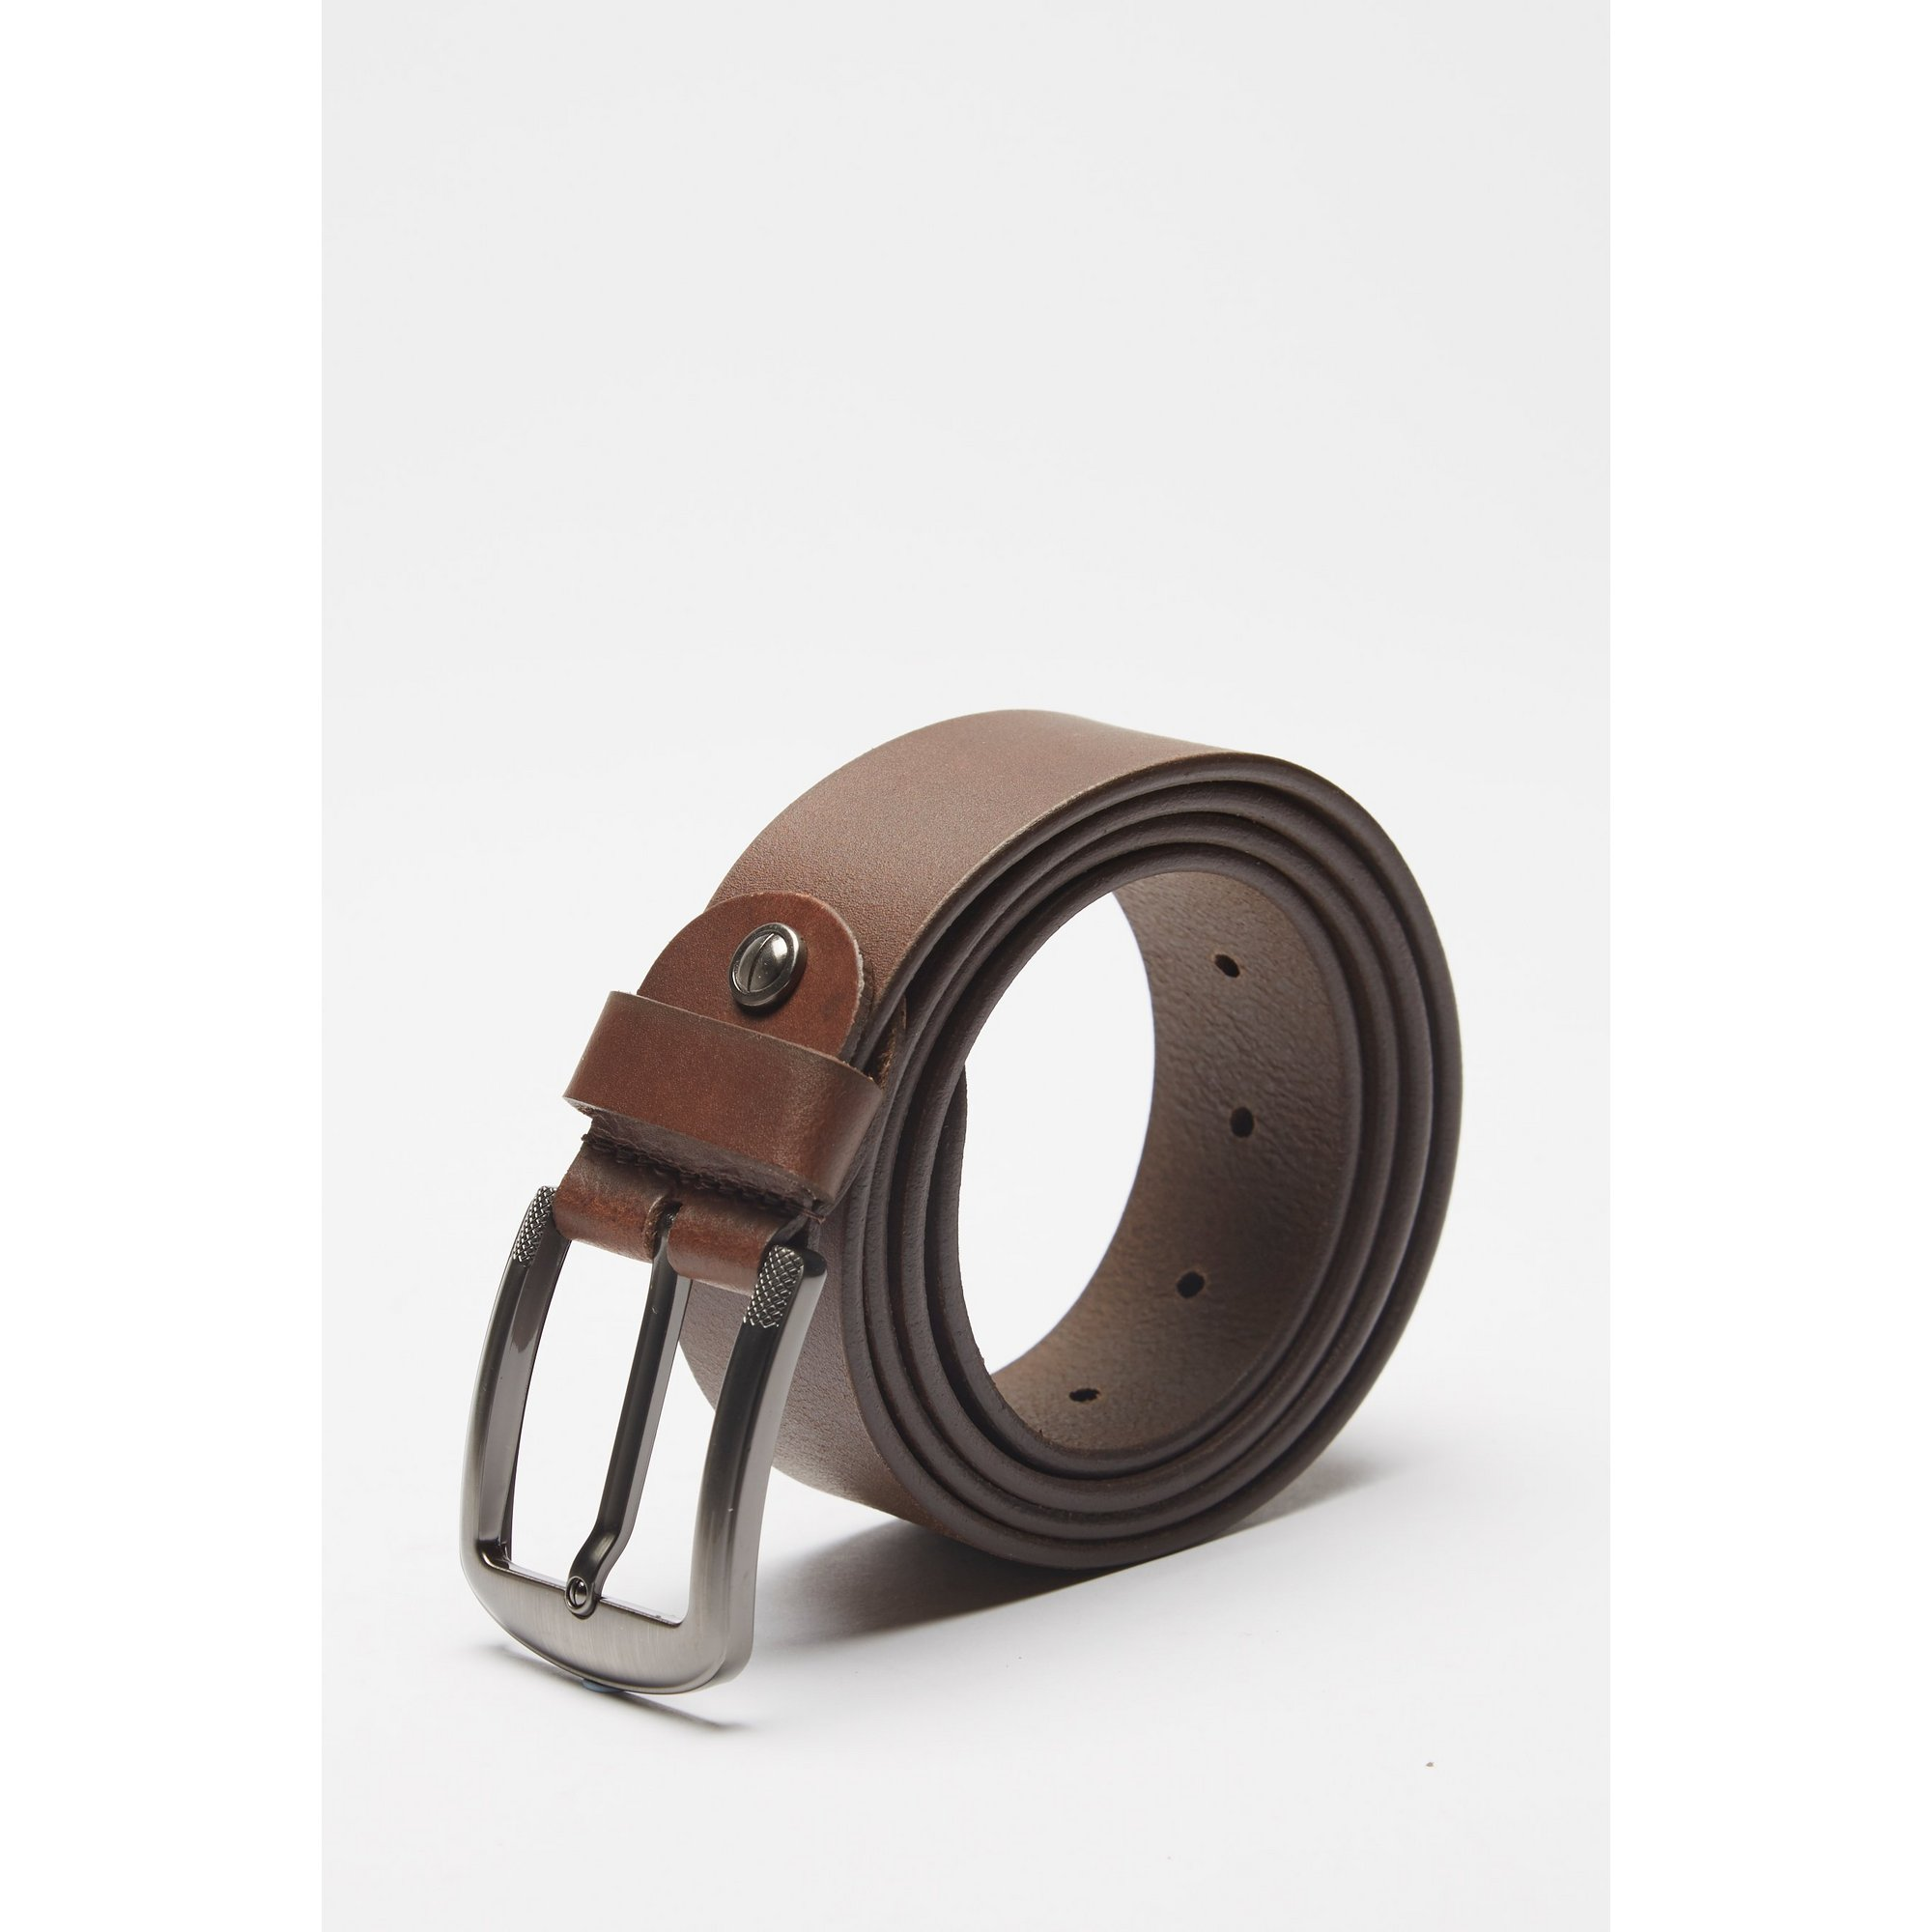 Image of Firelog Leather Flat Buckle Belt